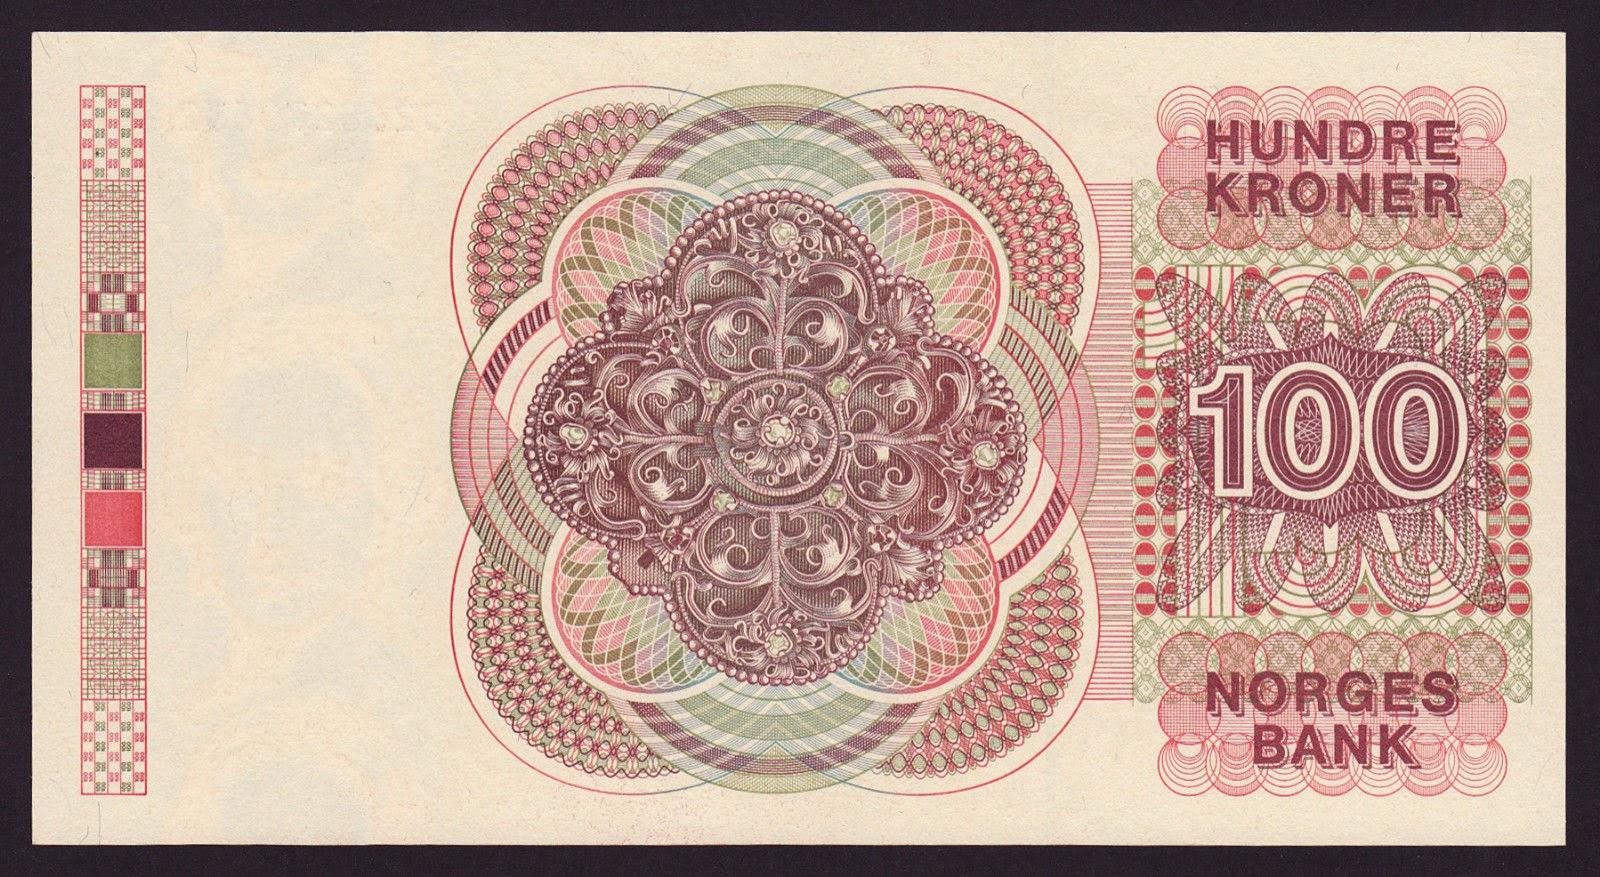 Norway Banknotes 100 Kroner note